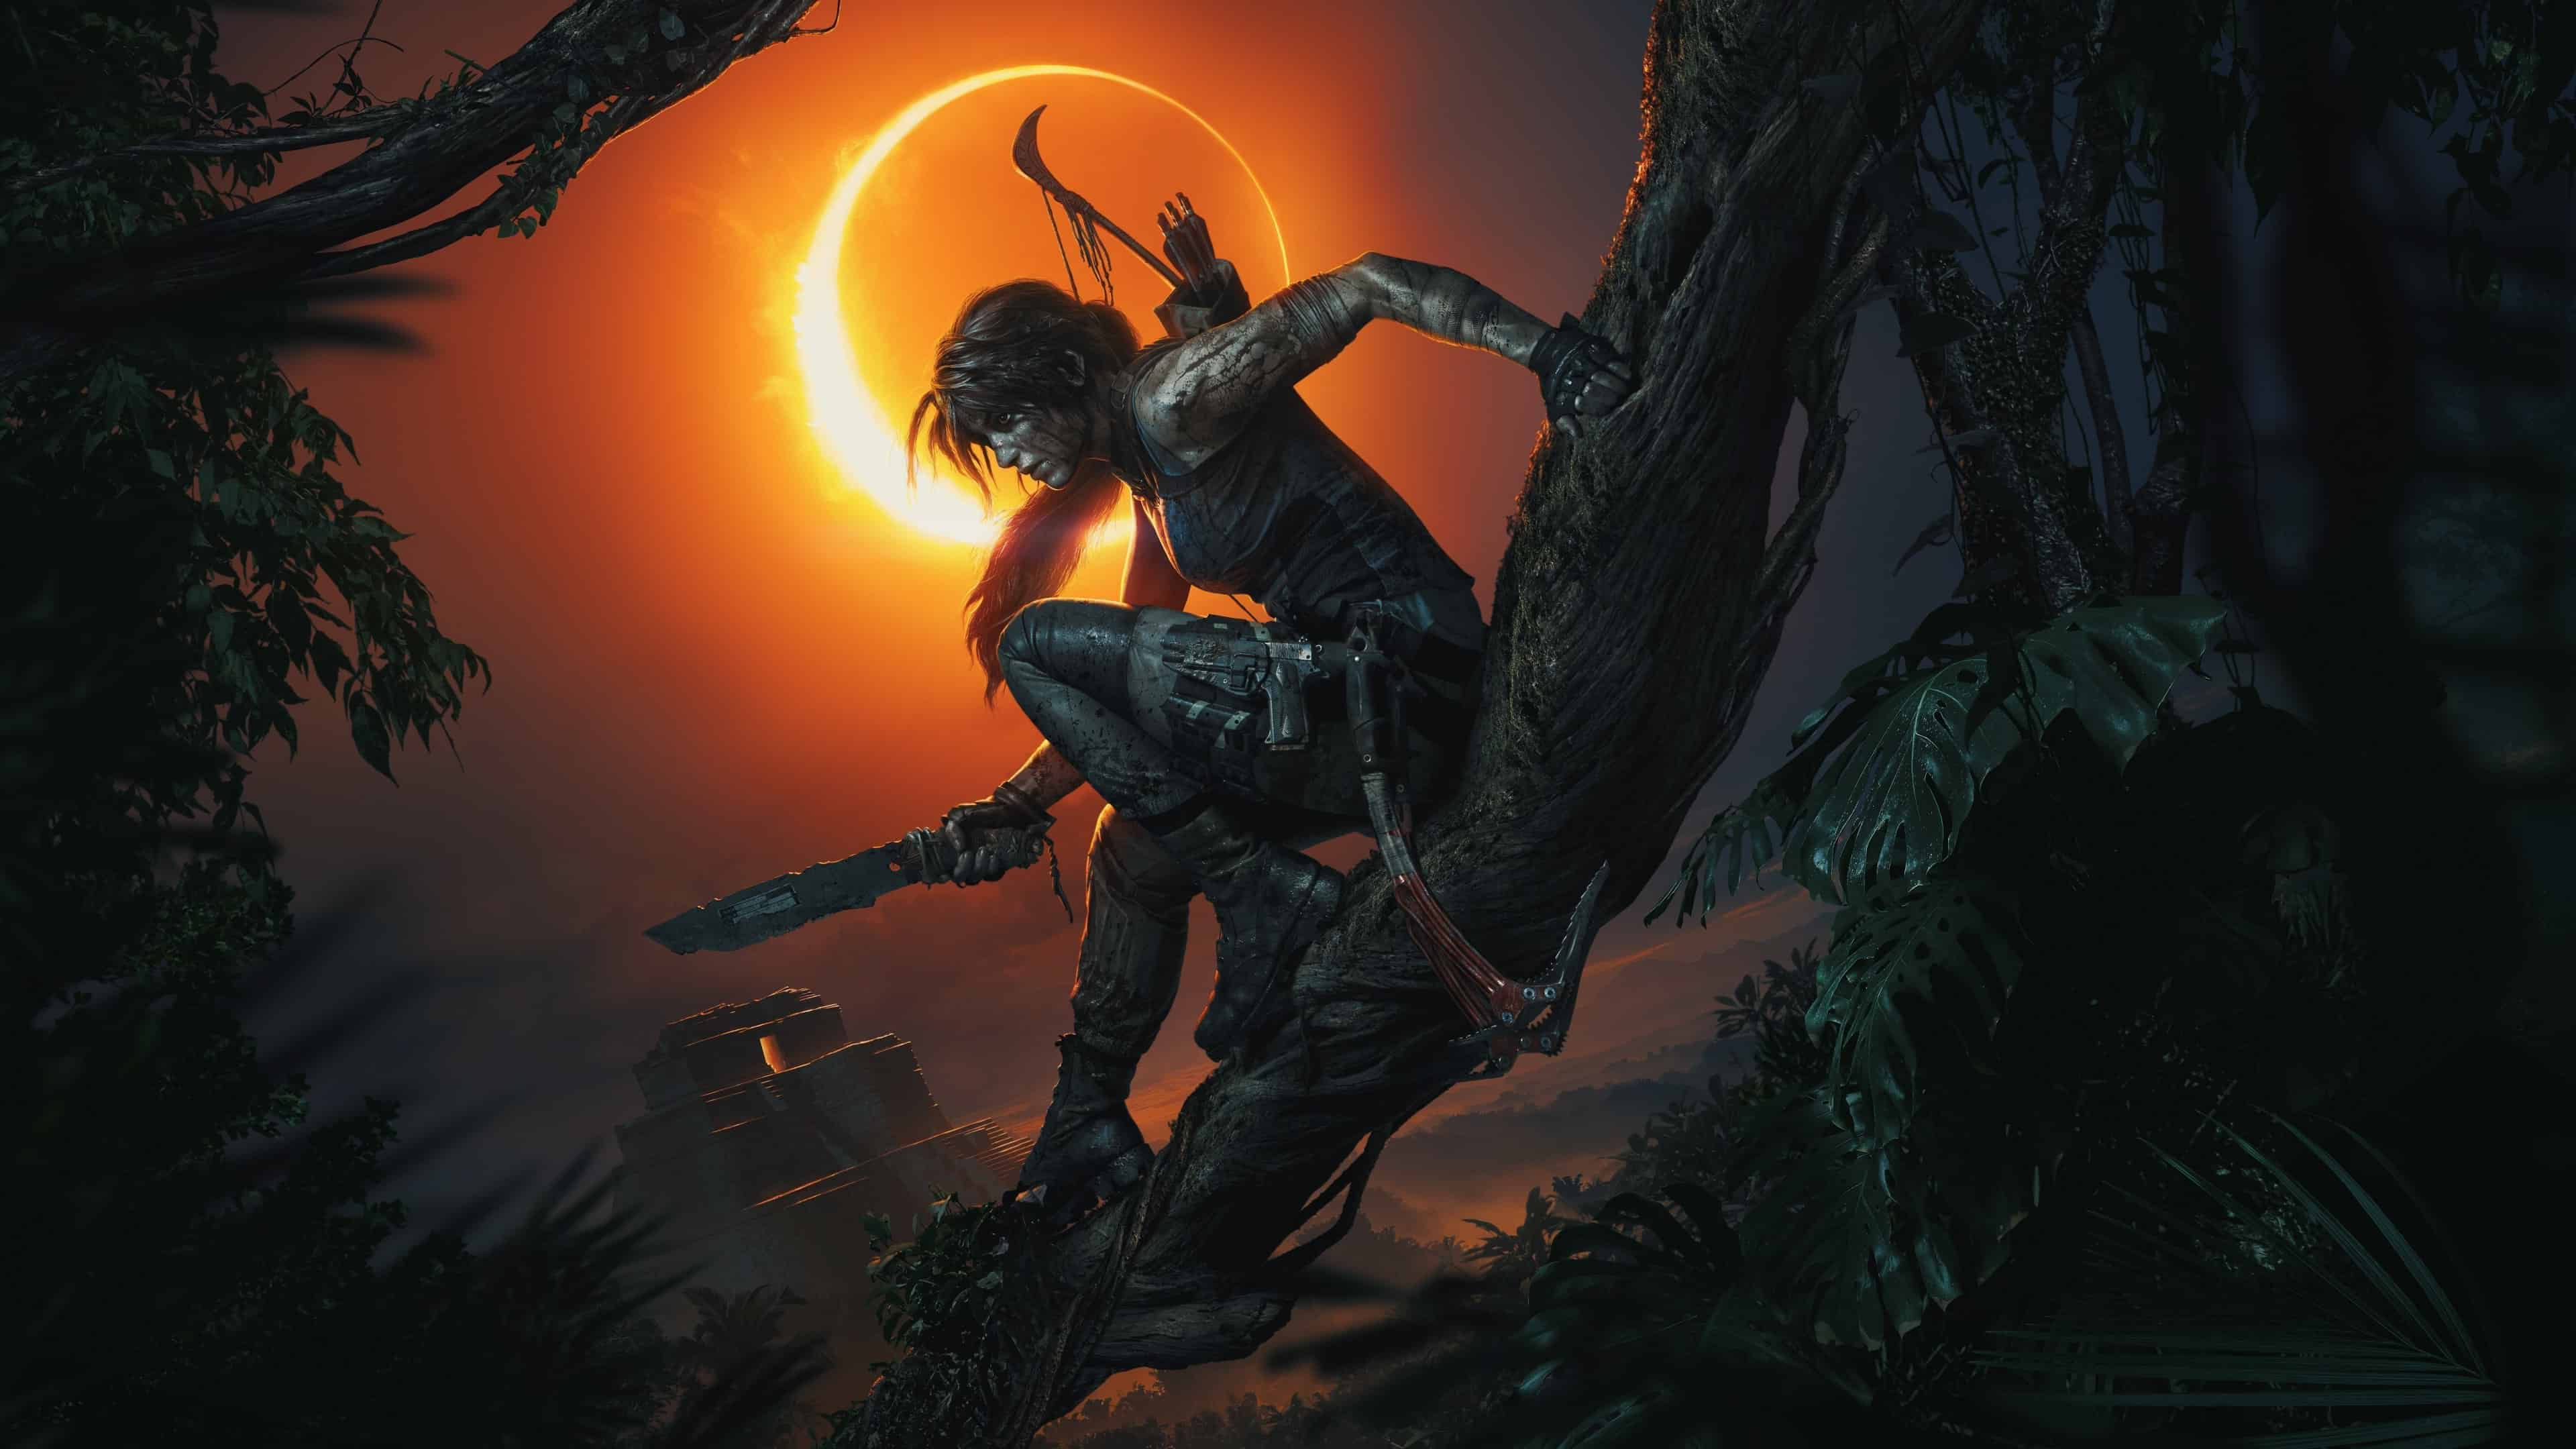 Shadow Of The Tomb Raider Lara Croft E3 Uhd 4k Wallpaper